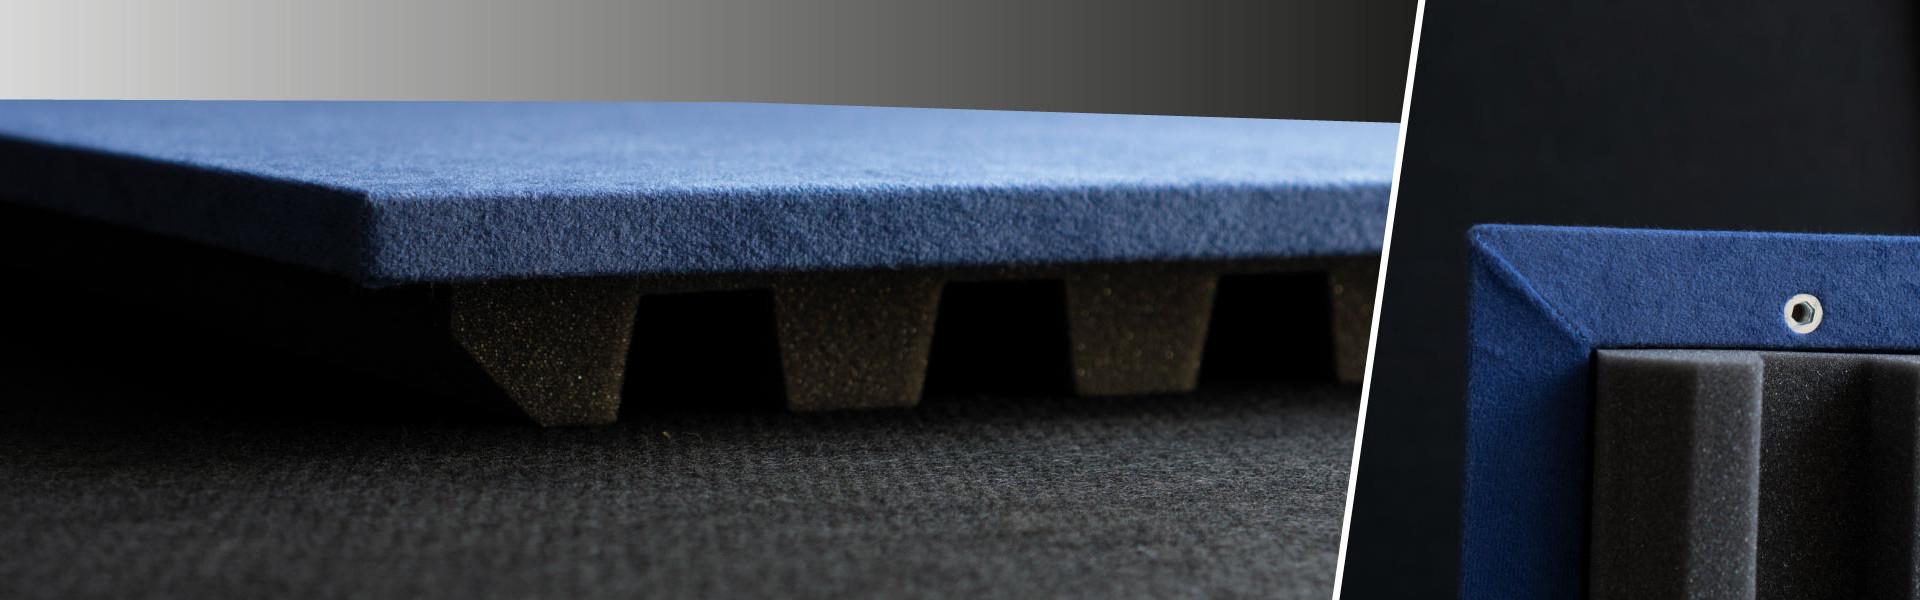 artnovion-product-helen-absorber-47ce6ce